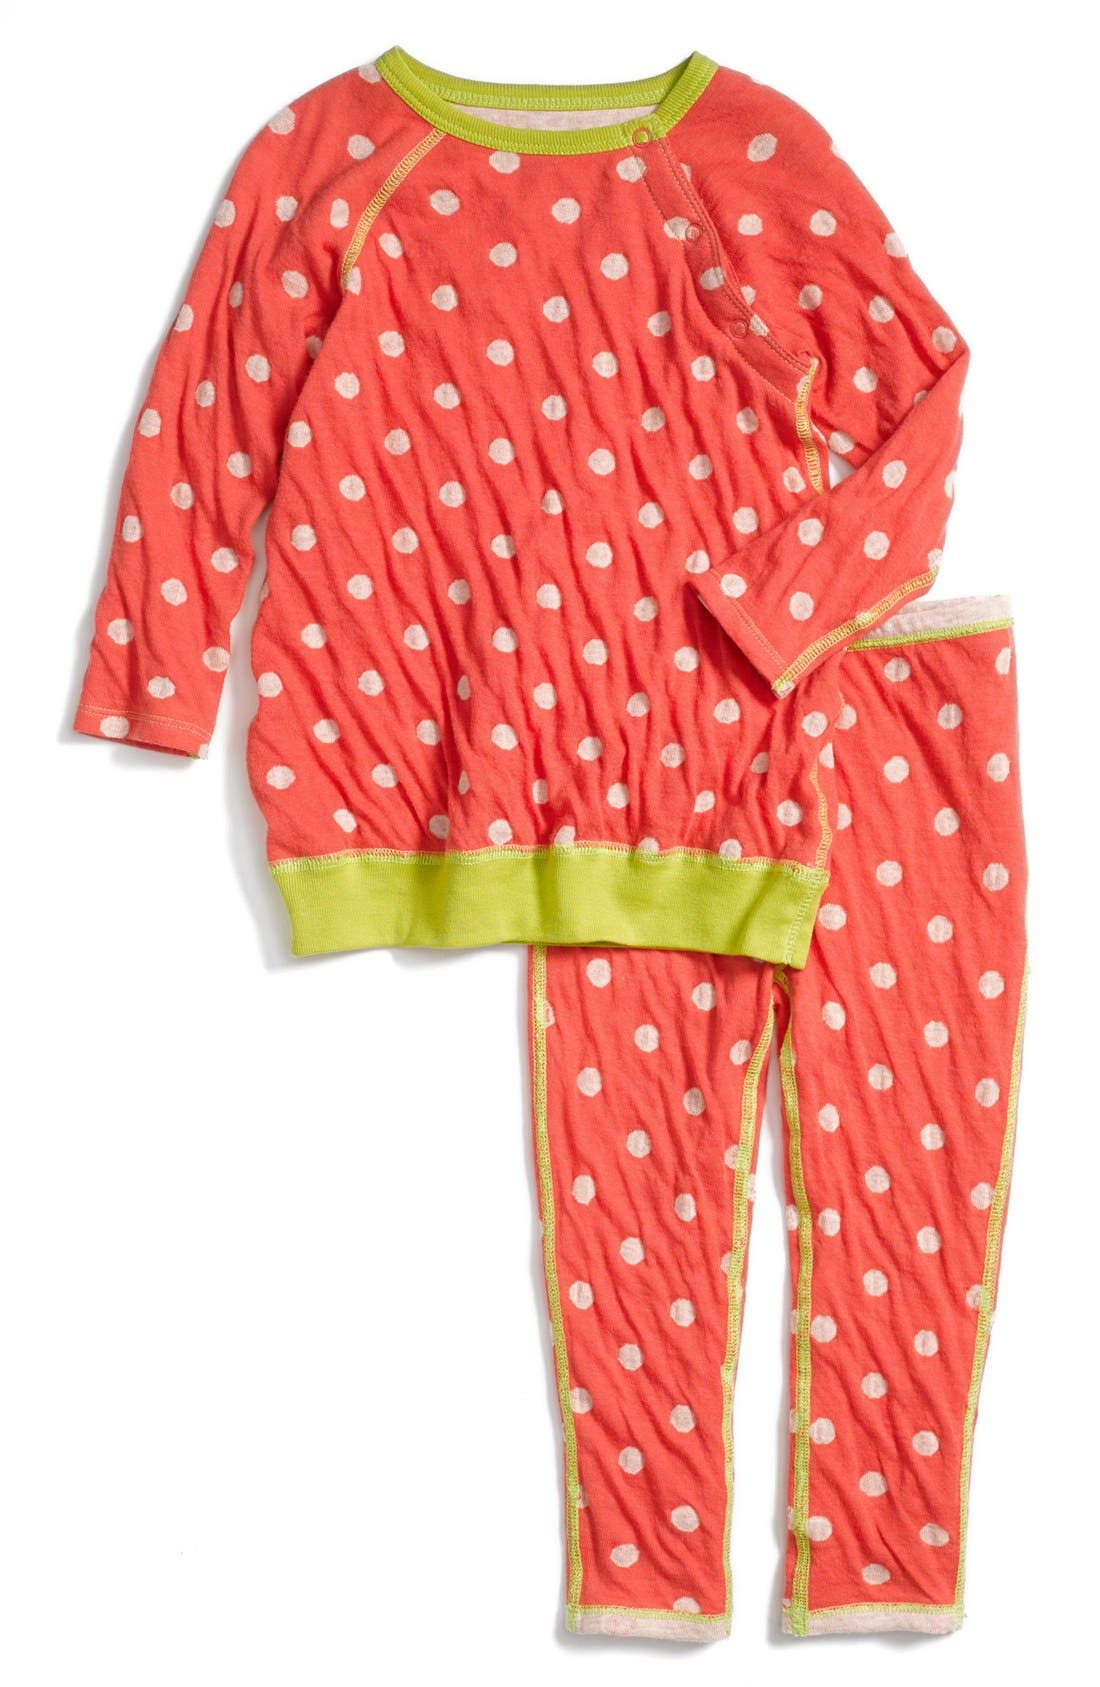 Alternate Image 1 Selected - Stem Baby Reversible Organic Cotton Sweatshirt & Pants Set (Baby)